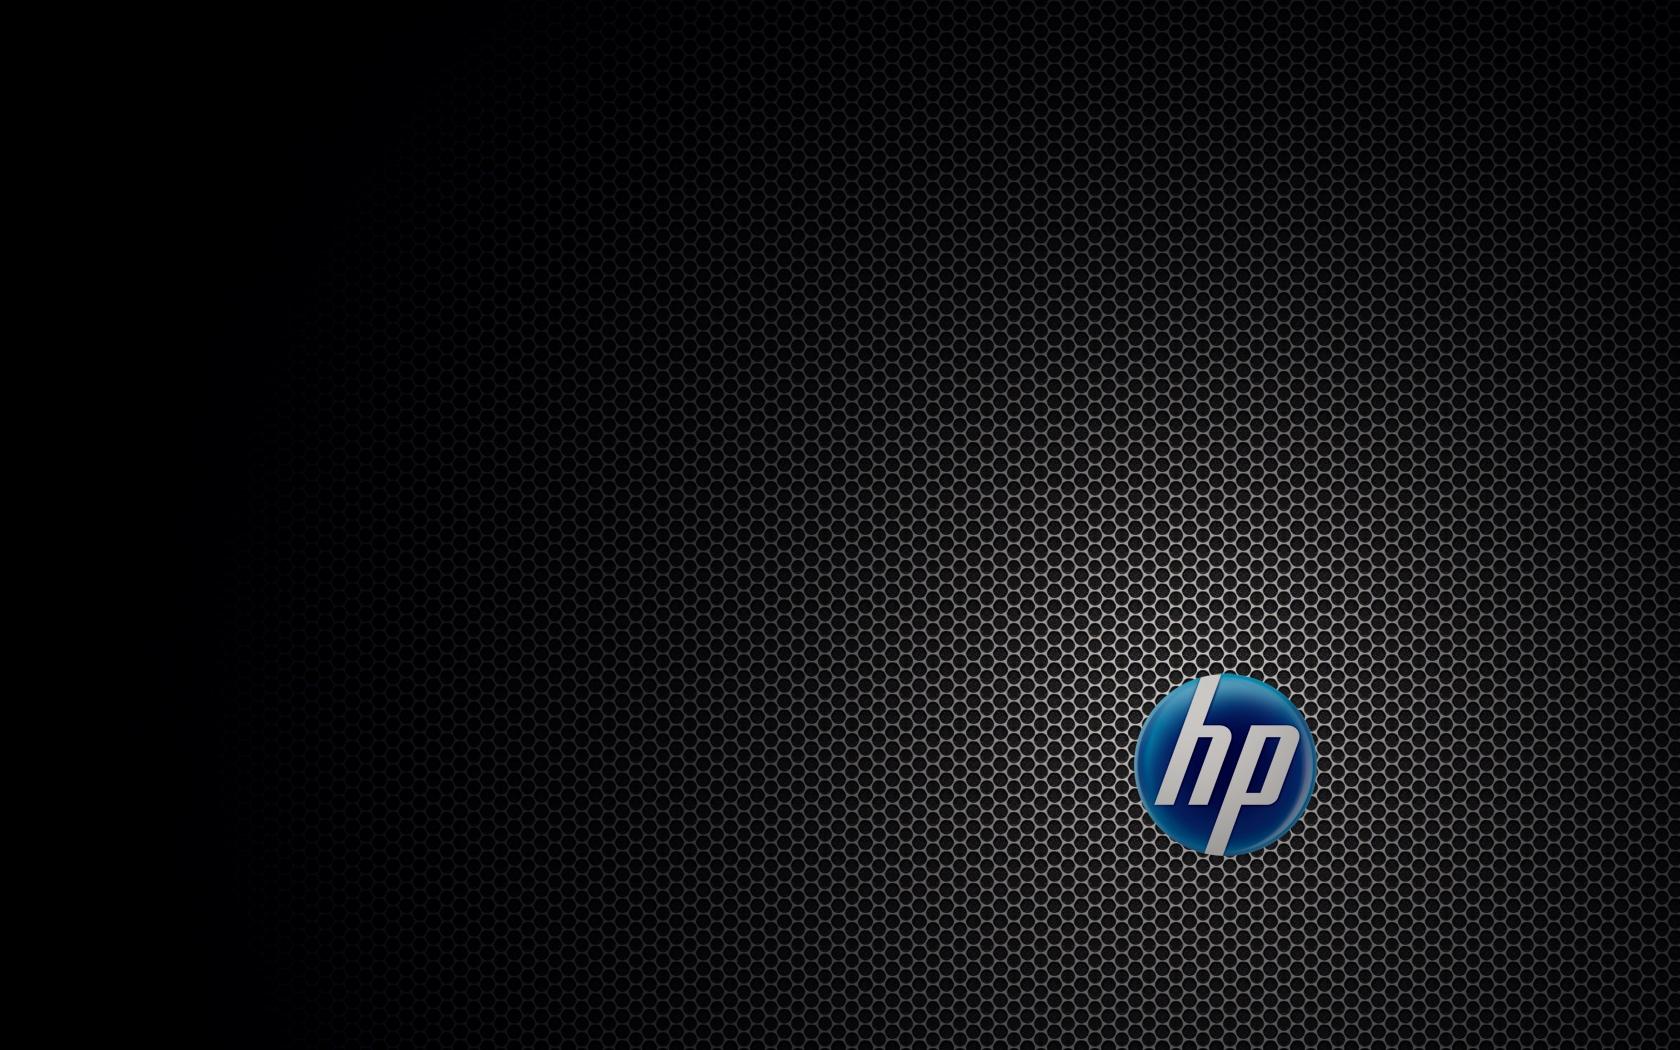 HP Wallpaper